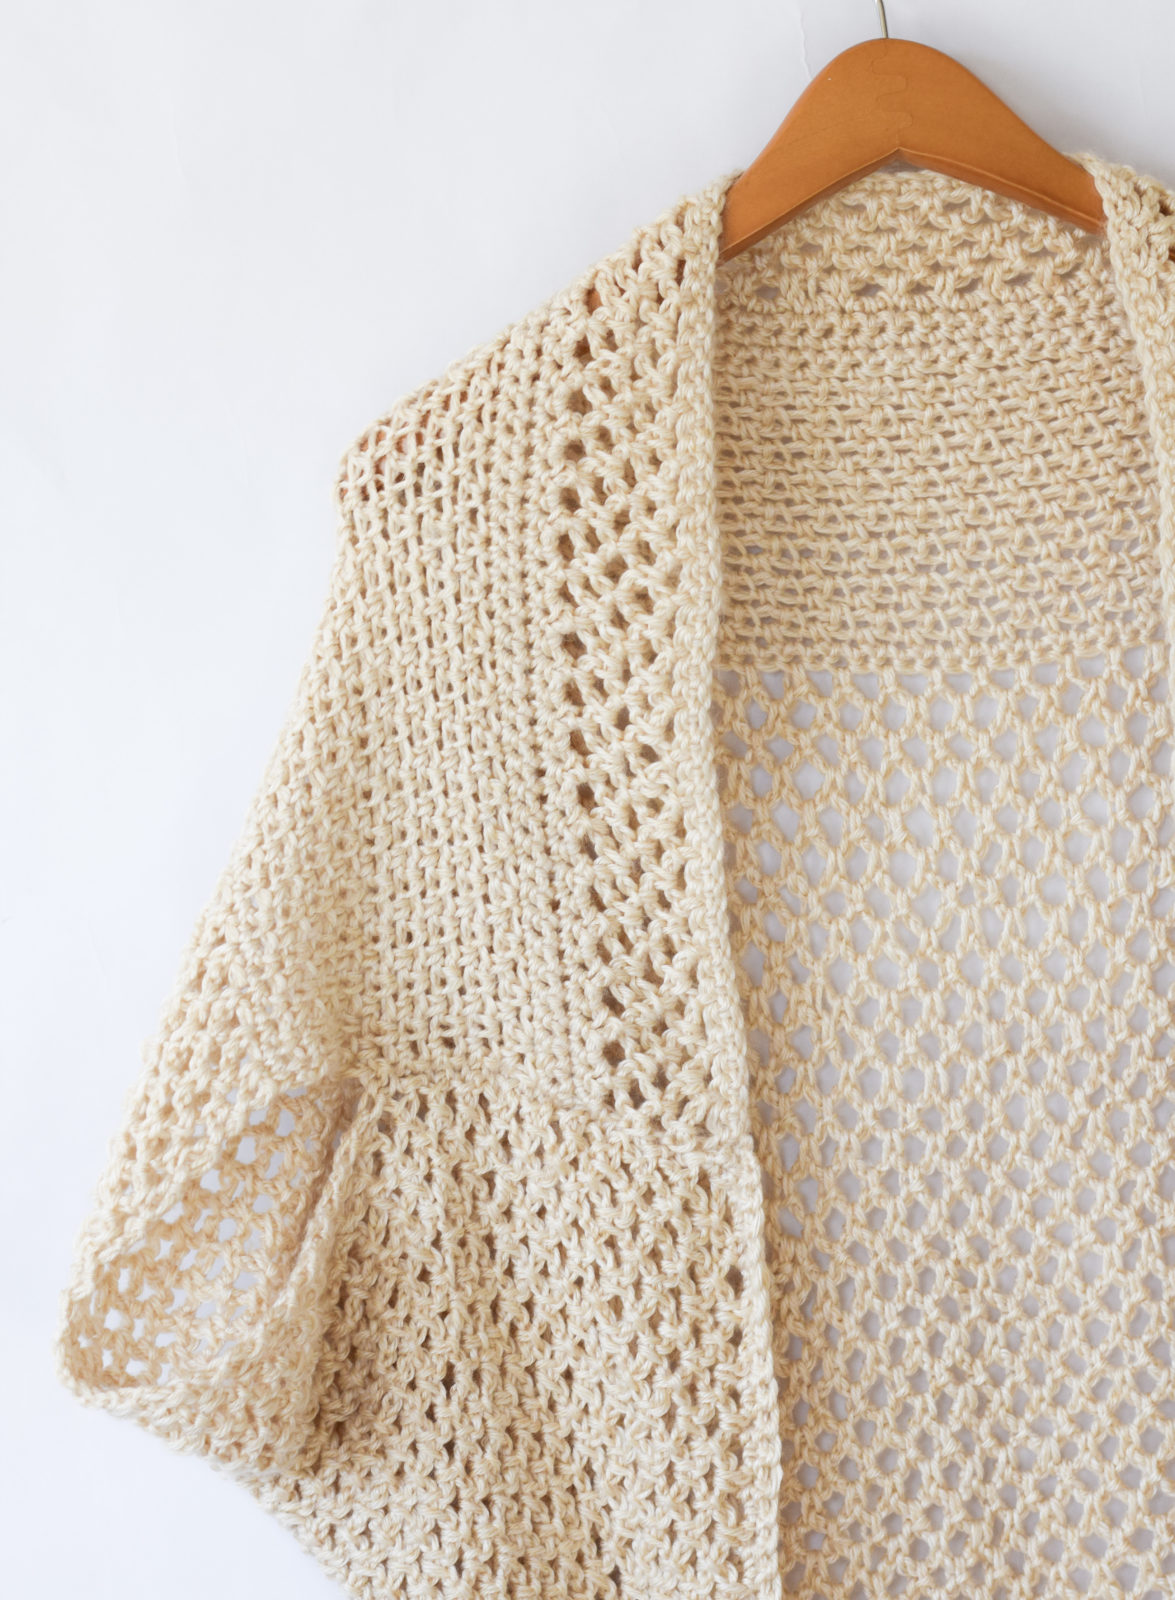 Mod mesh honey blanket sweater mama in a stitch easy crochet sweater pattern shrug bankloansurffo Gallery